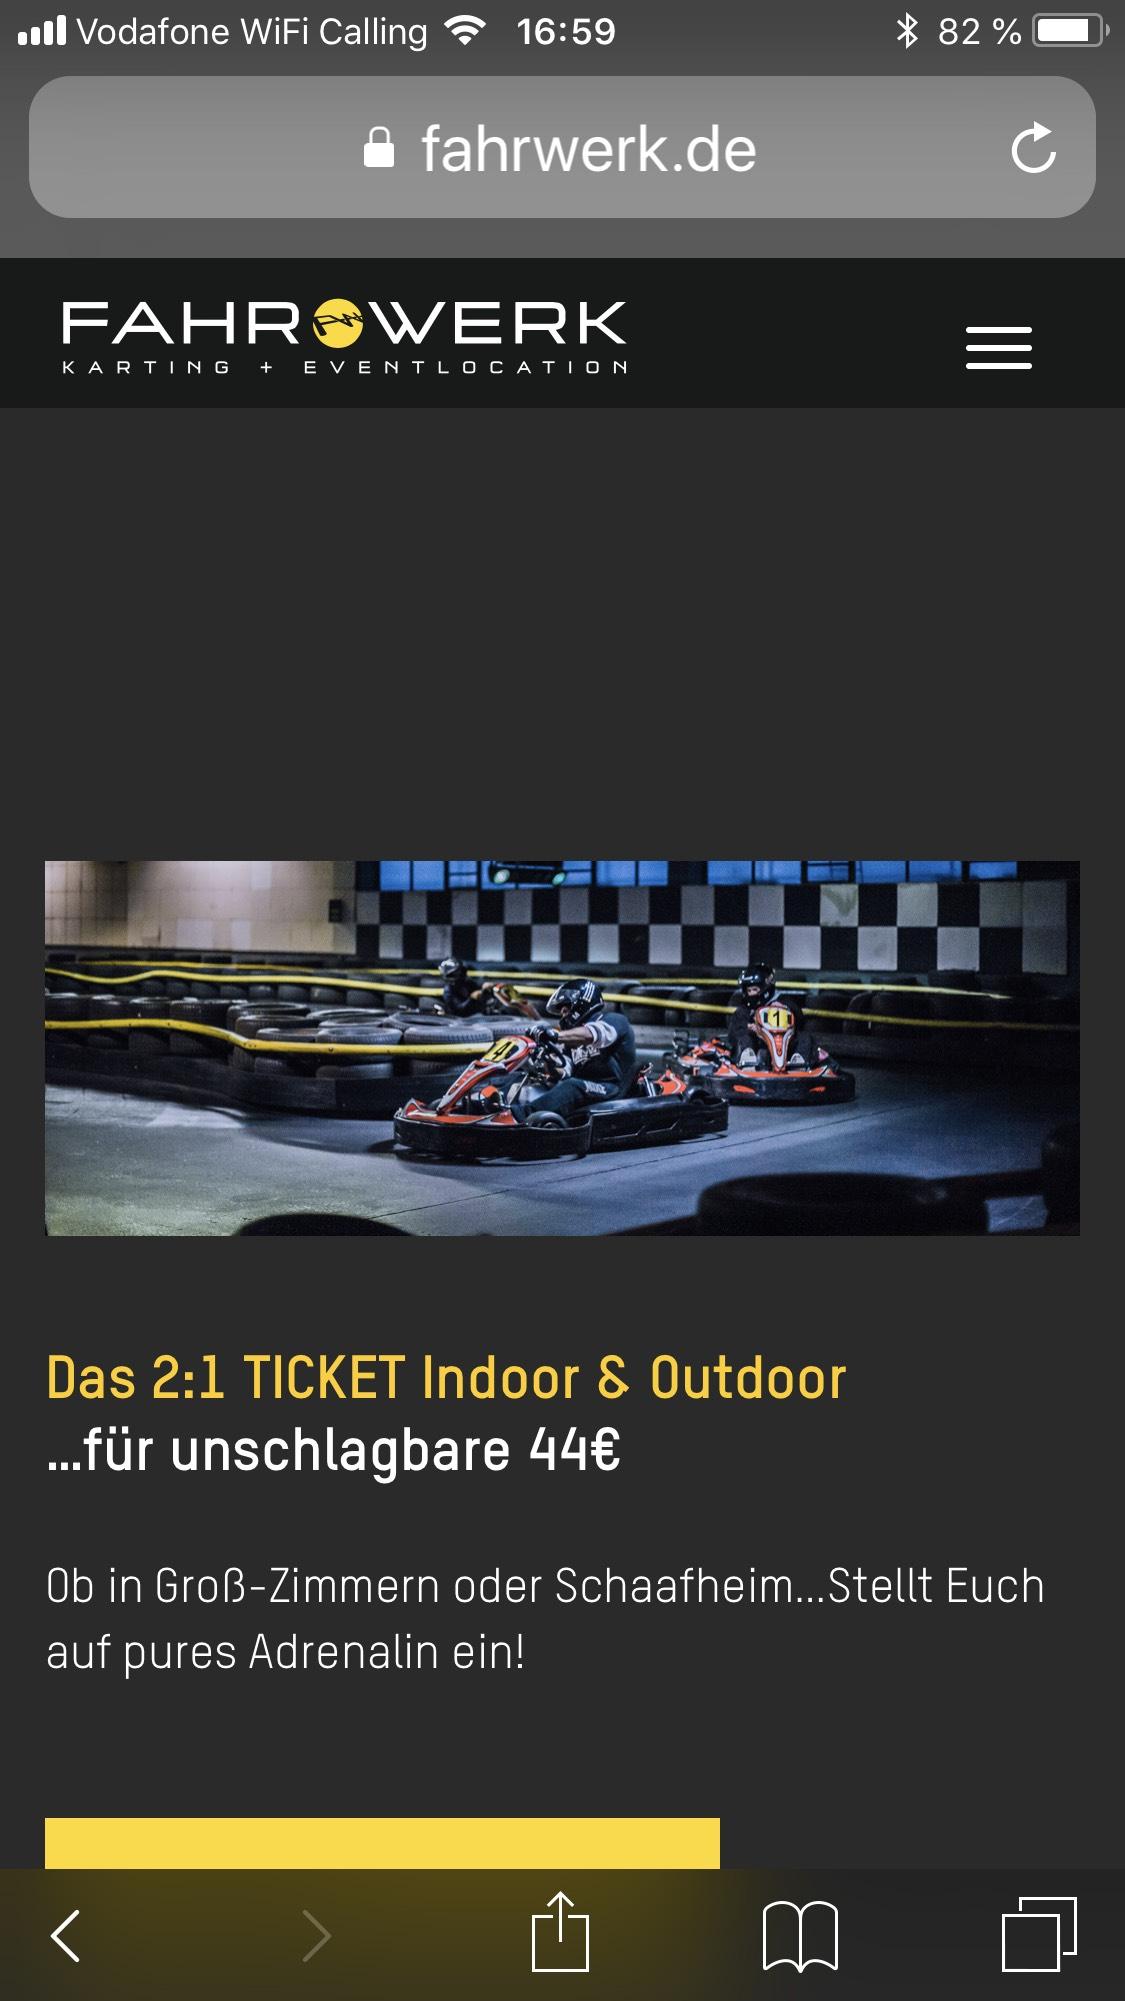 Lokal Schaafheim Groß Zimmern Gokart Fahrwerk